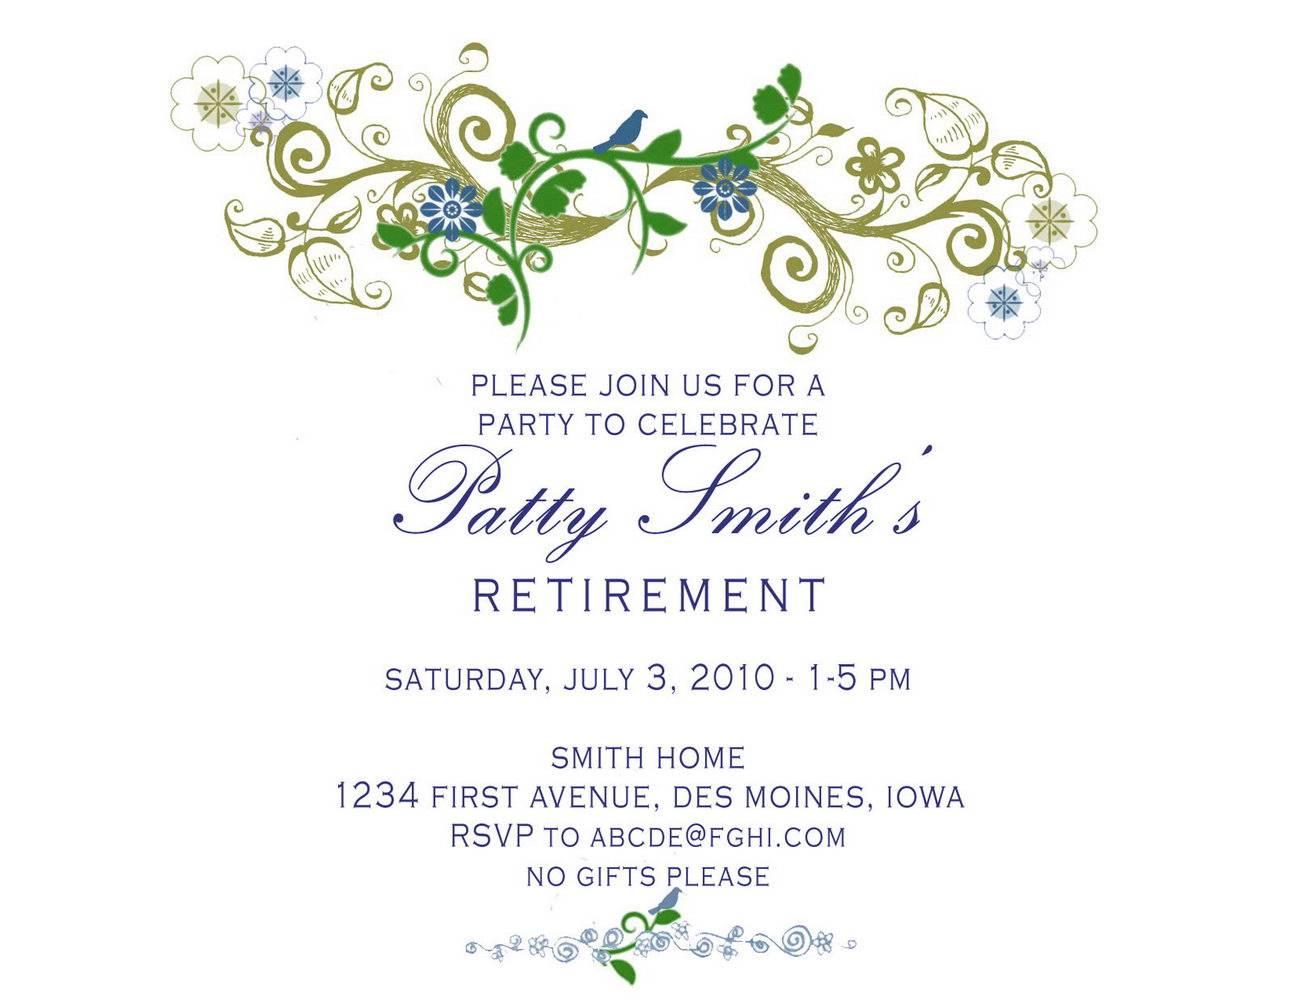 Printable Retirement Party Invitation Templates